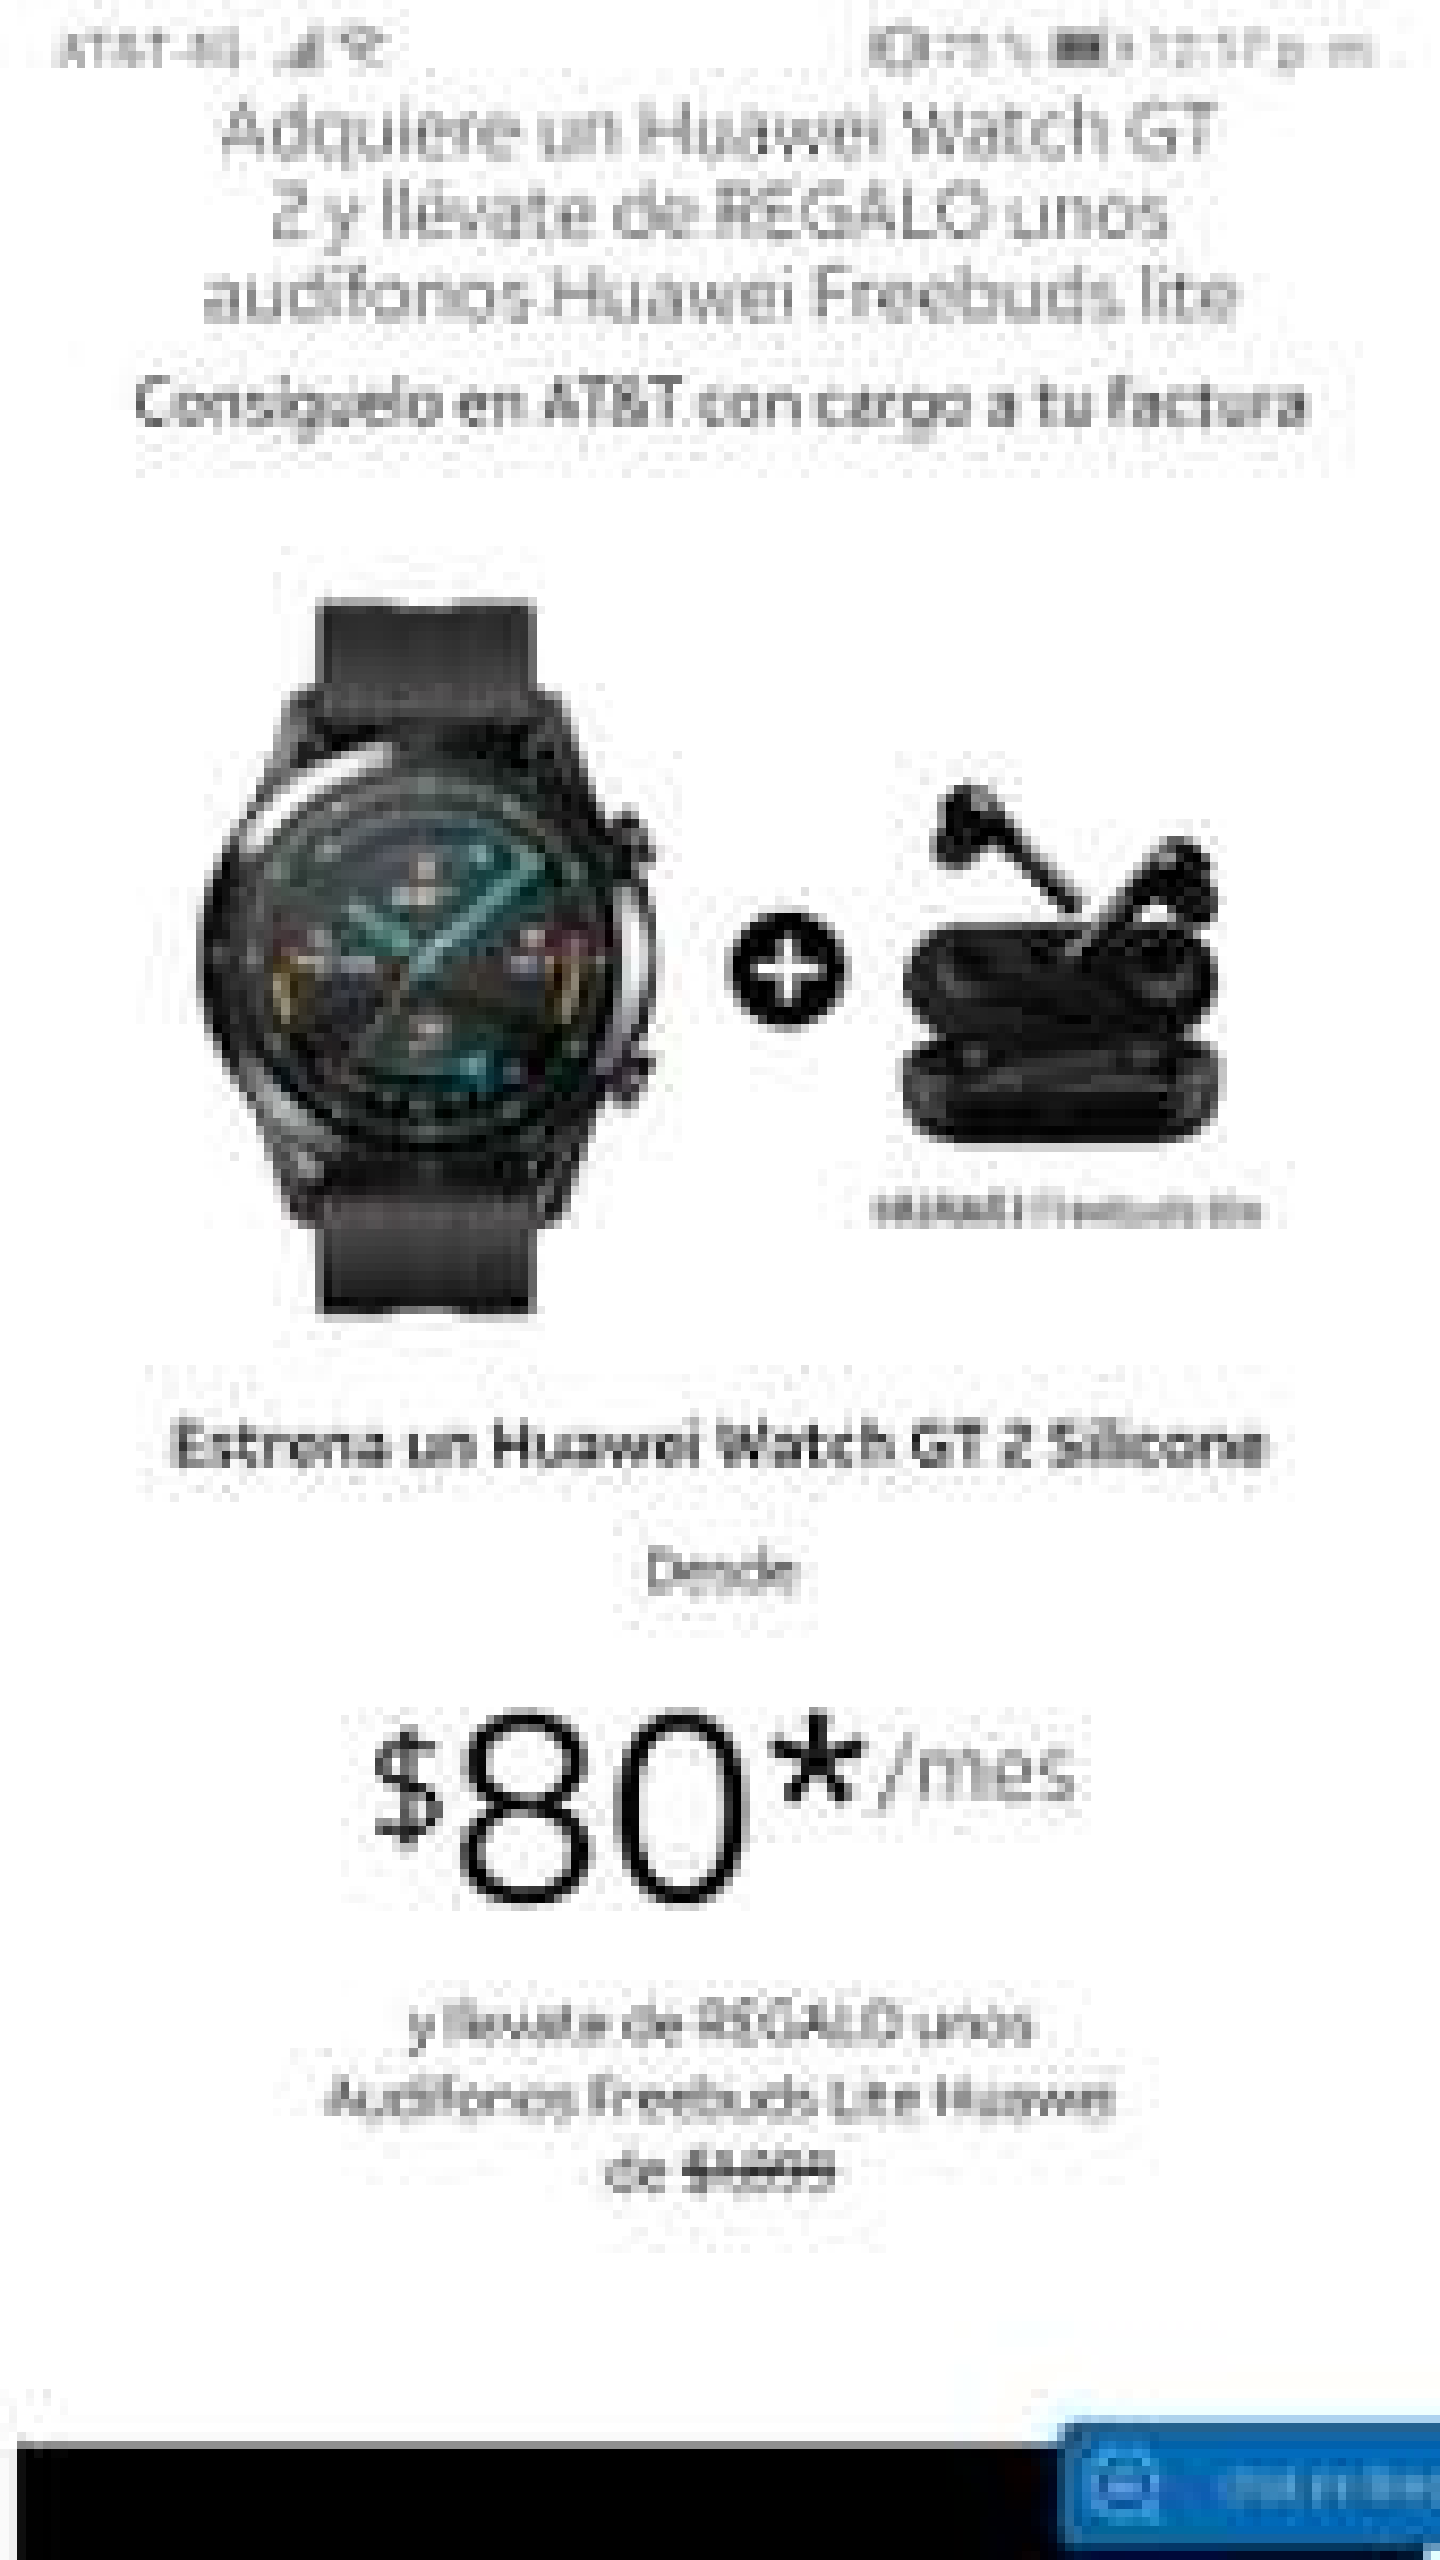 AT&T  Huawei Watch GT 2 + Freebuds lite